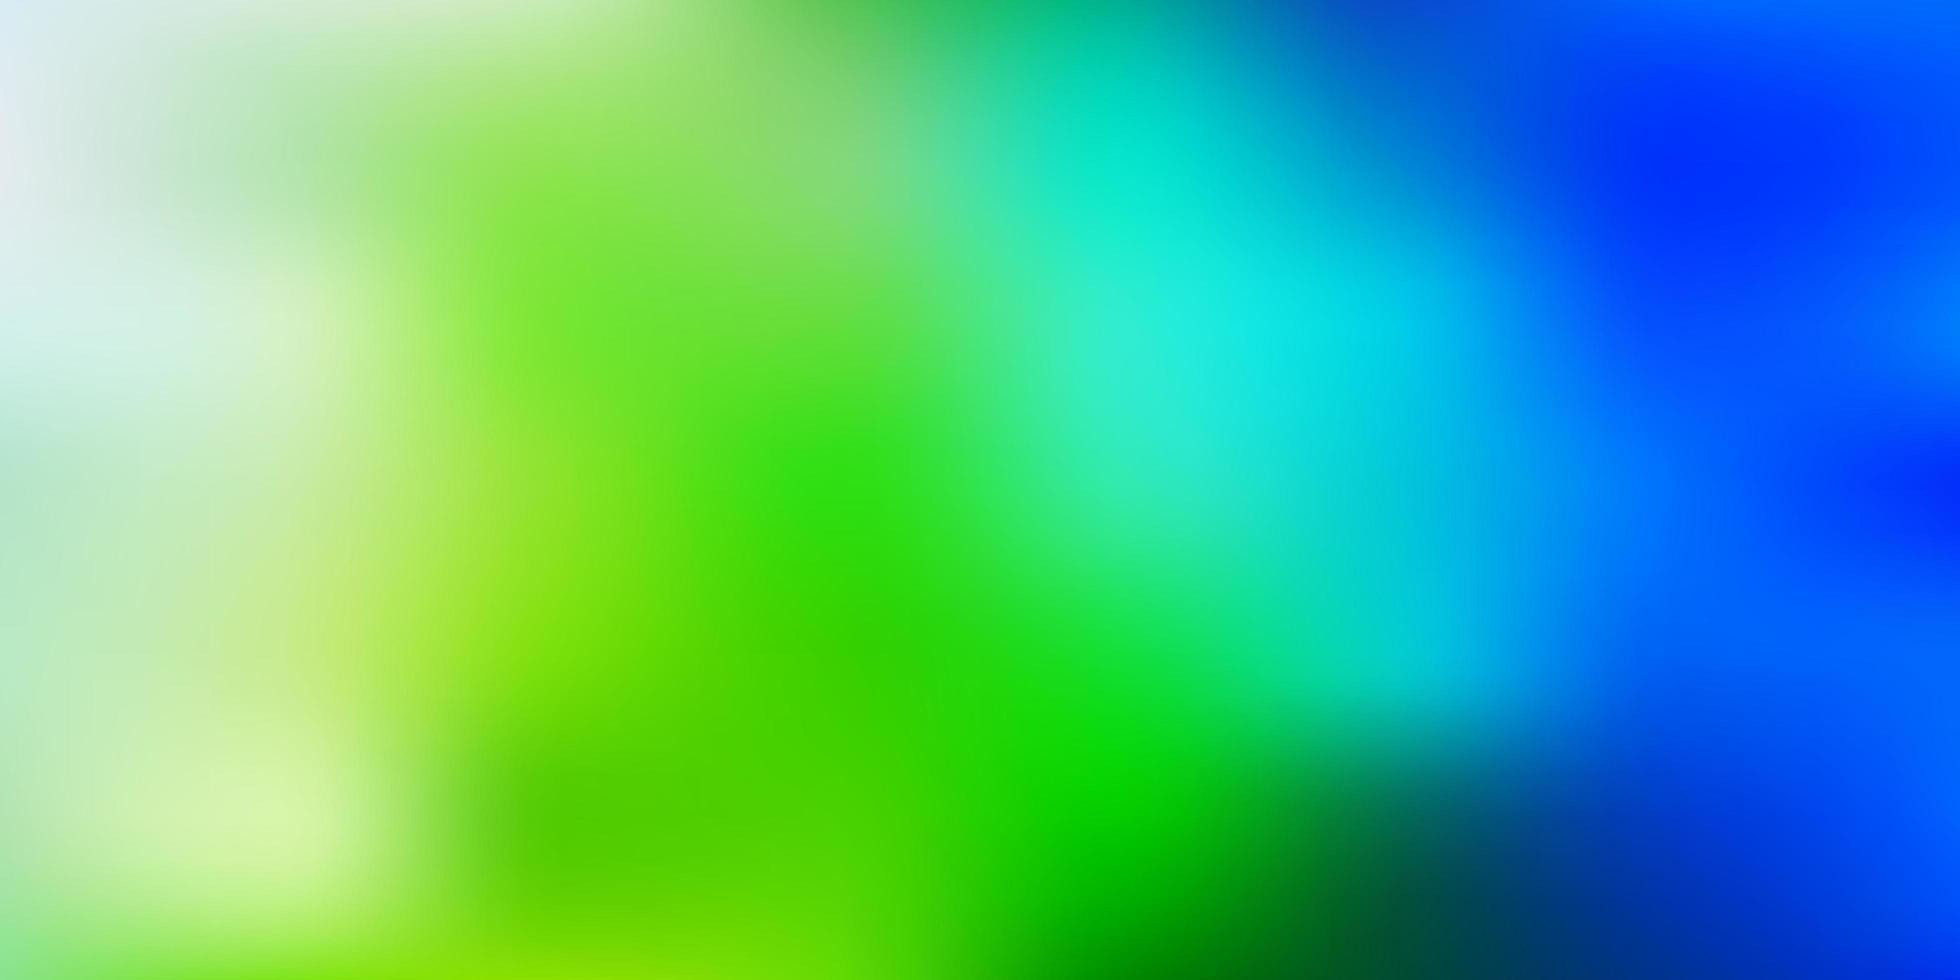 azul claro verde vetor turva padrão